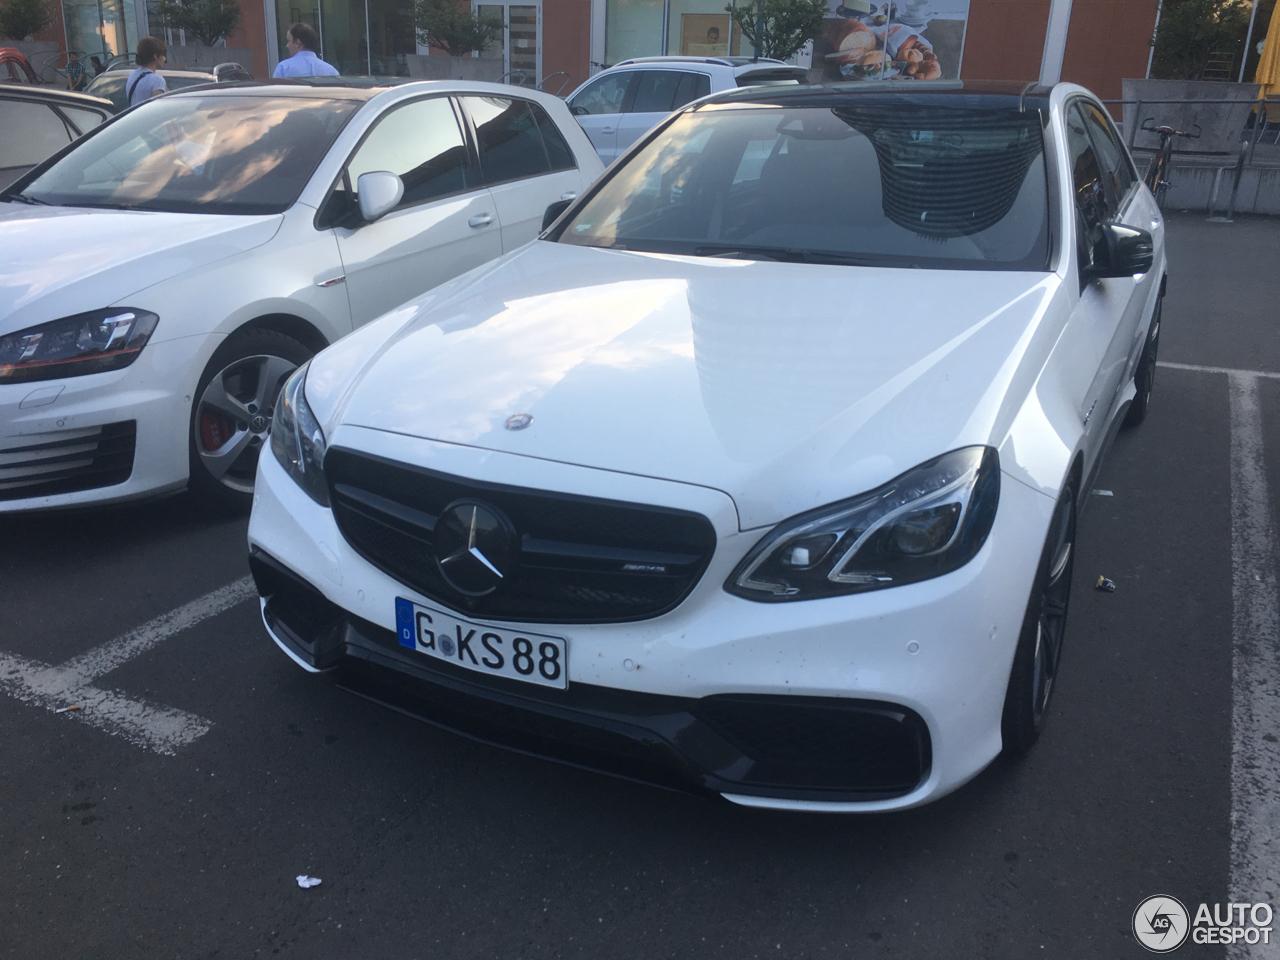 Mercedes benz e 63 amg w212 2013 14 iulie 2018 autogespot for Mercedes benz 6